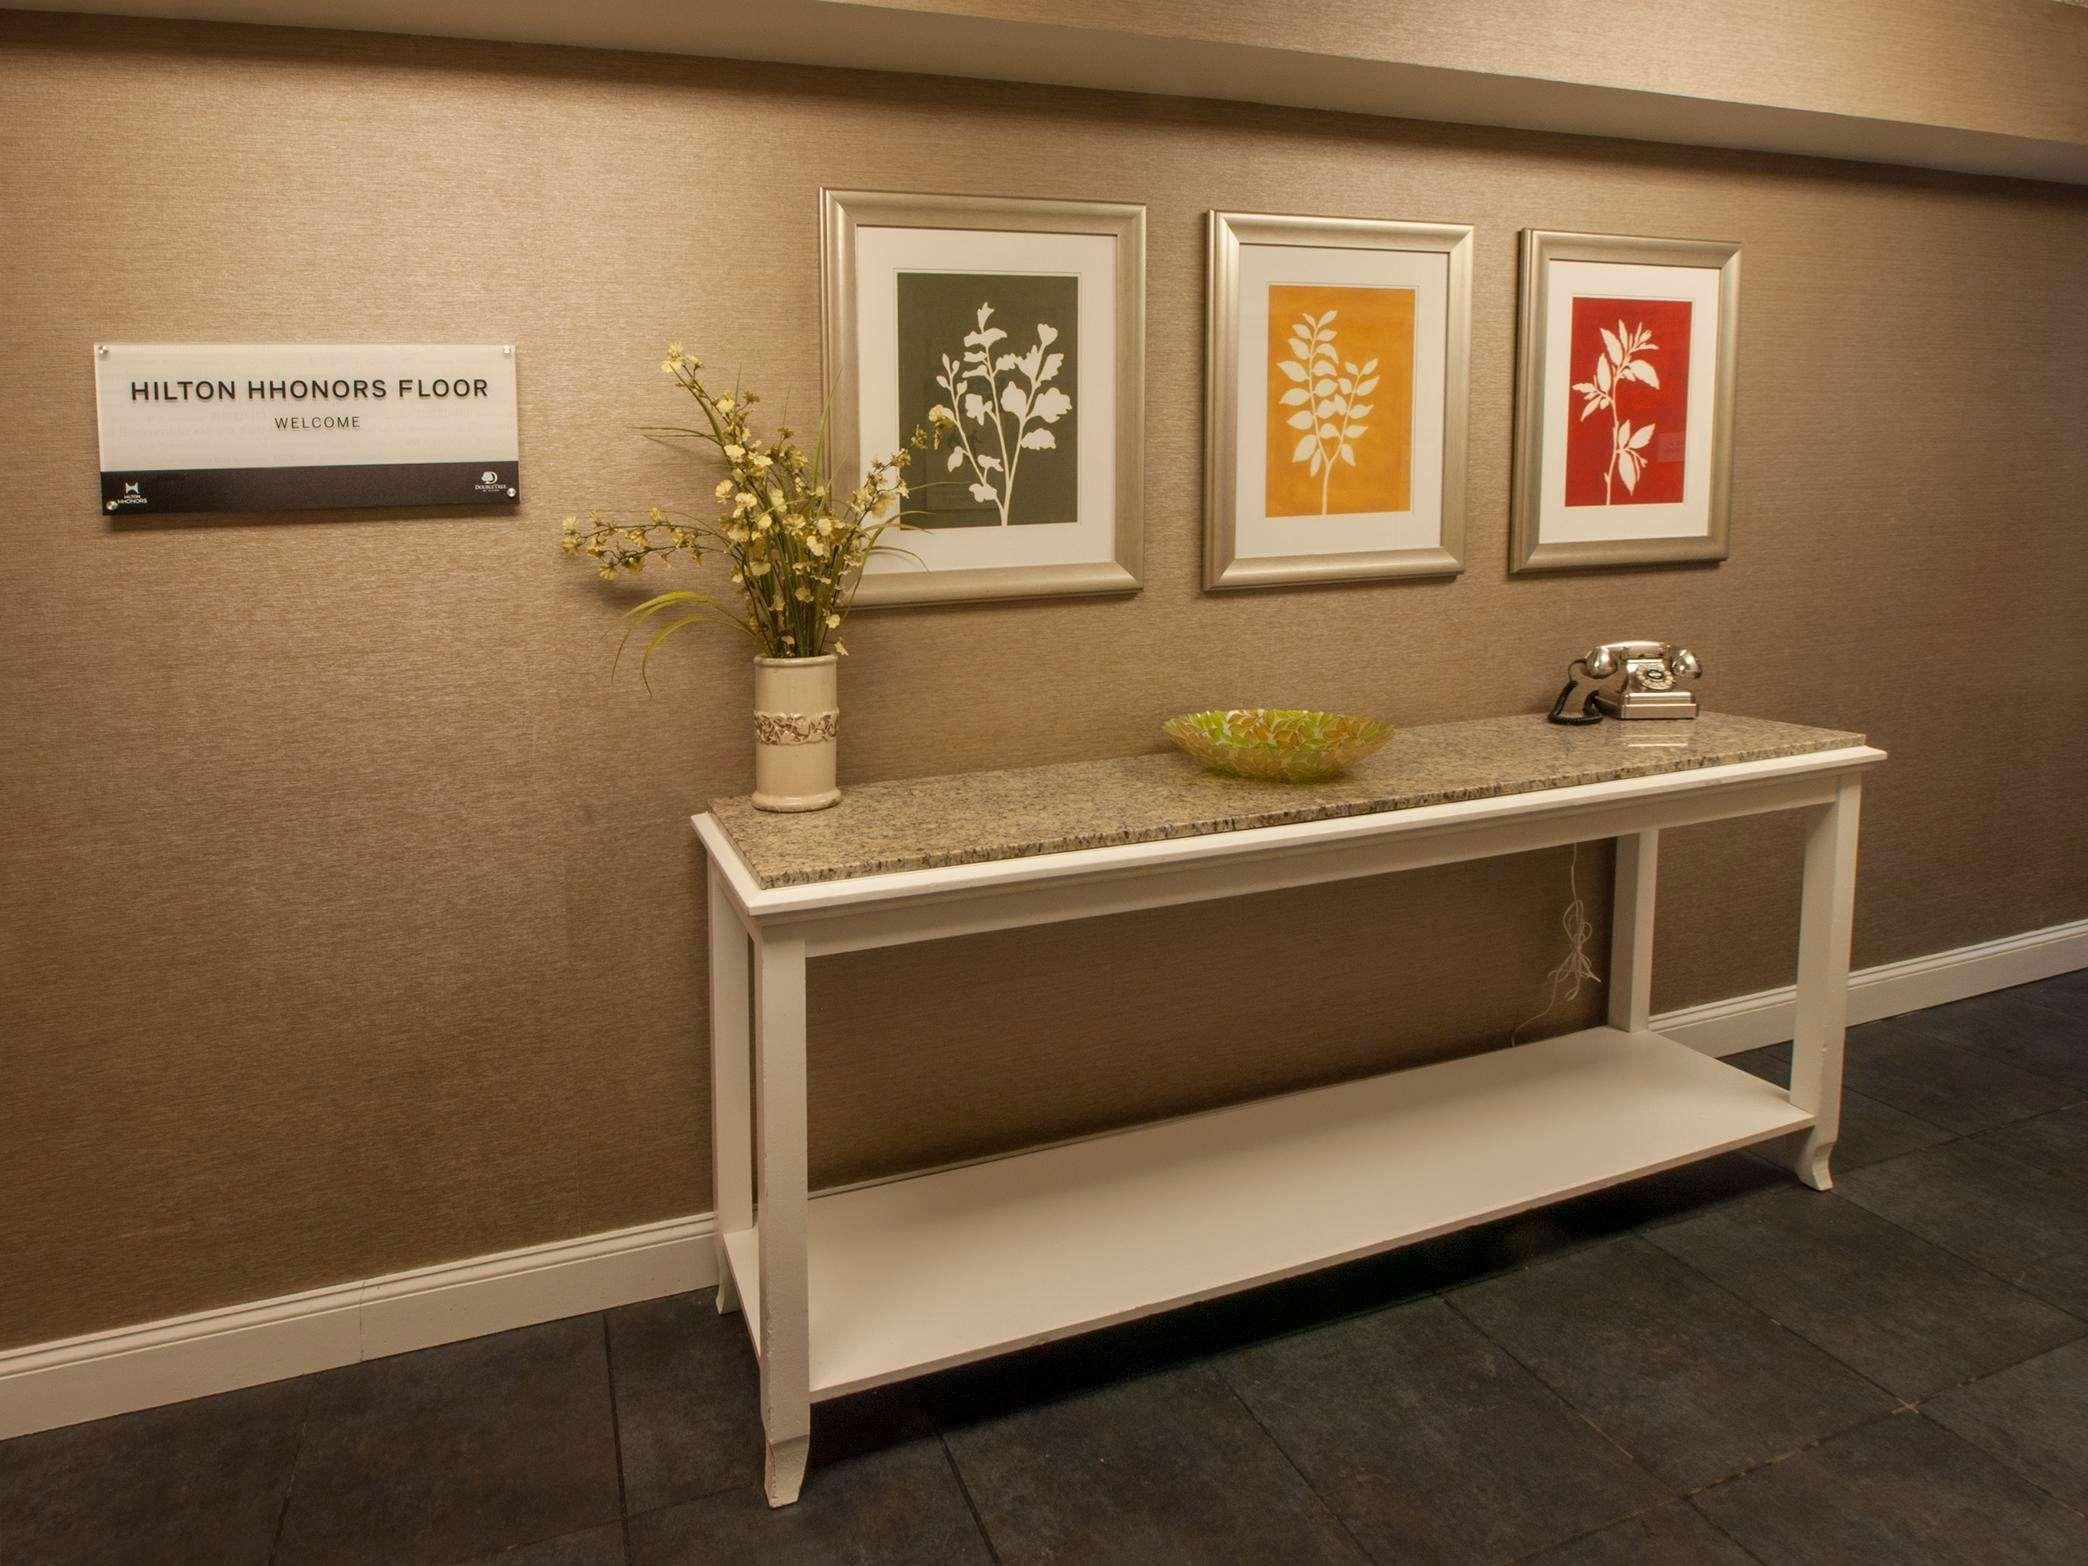 DoubleTree by Hilton Hotel Buffalo - Amherst image 11